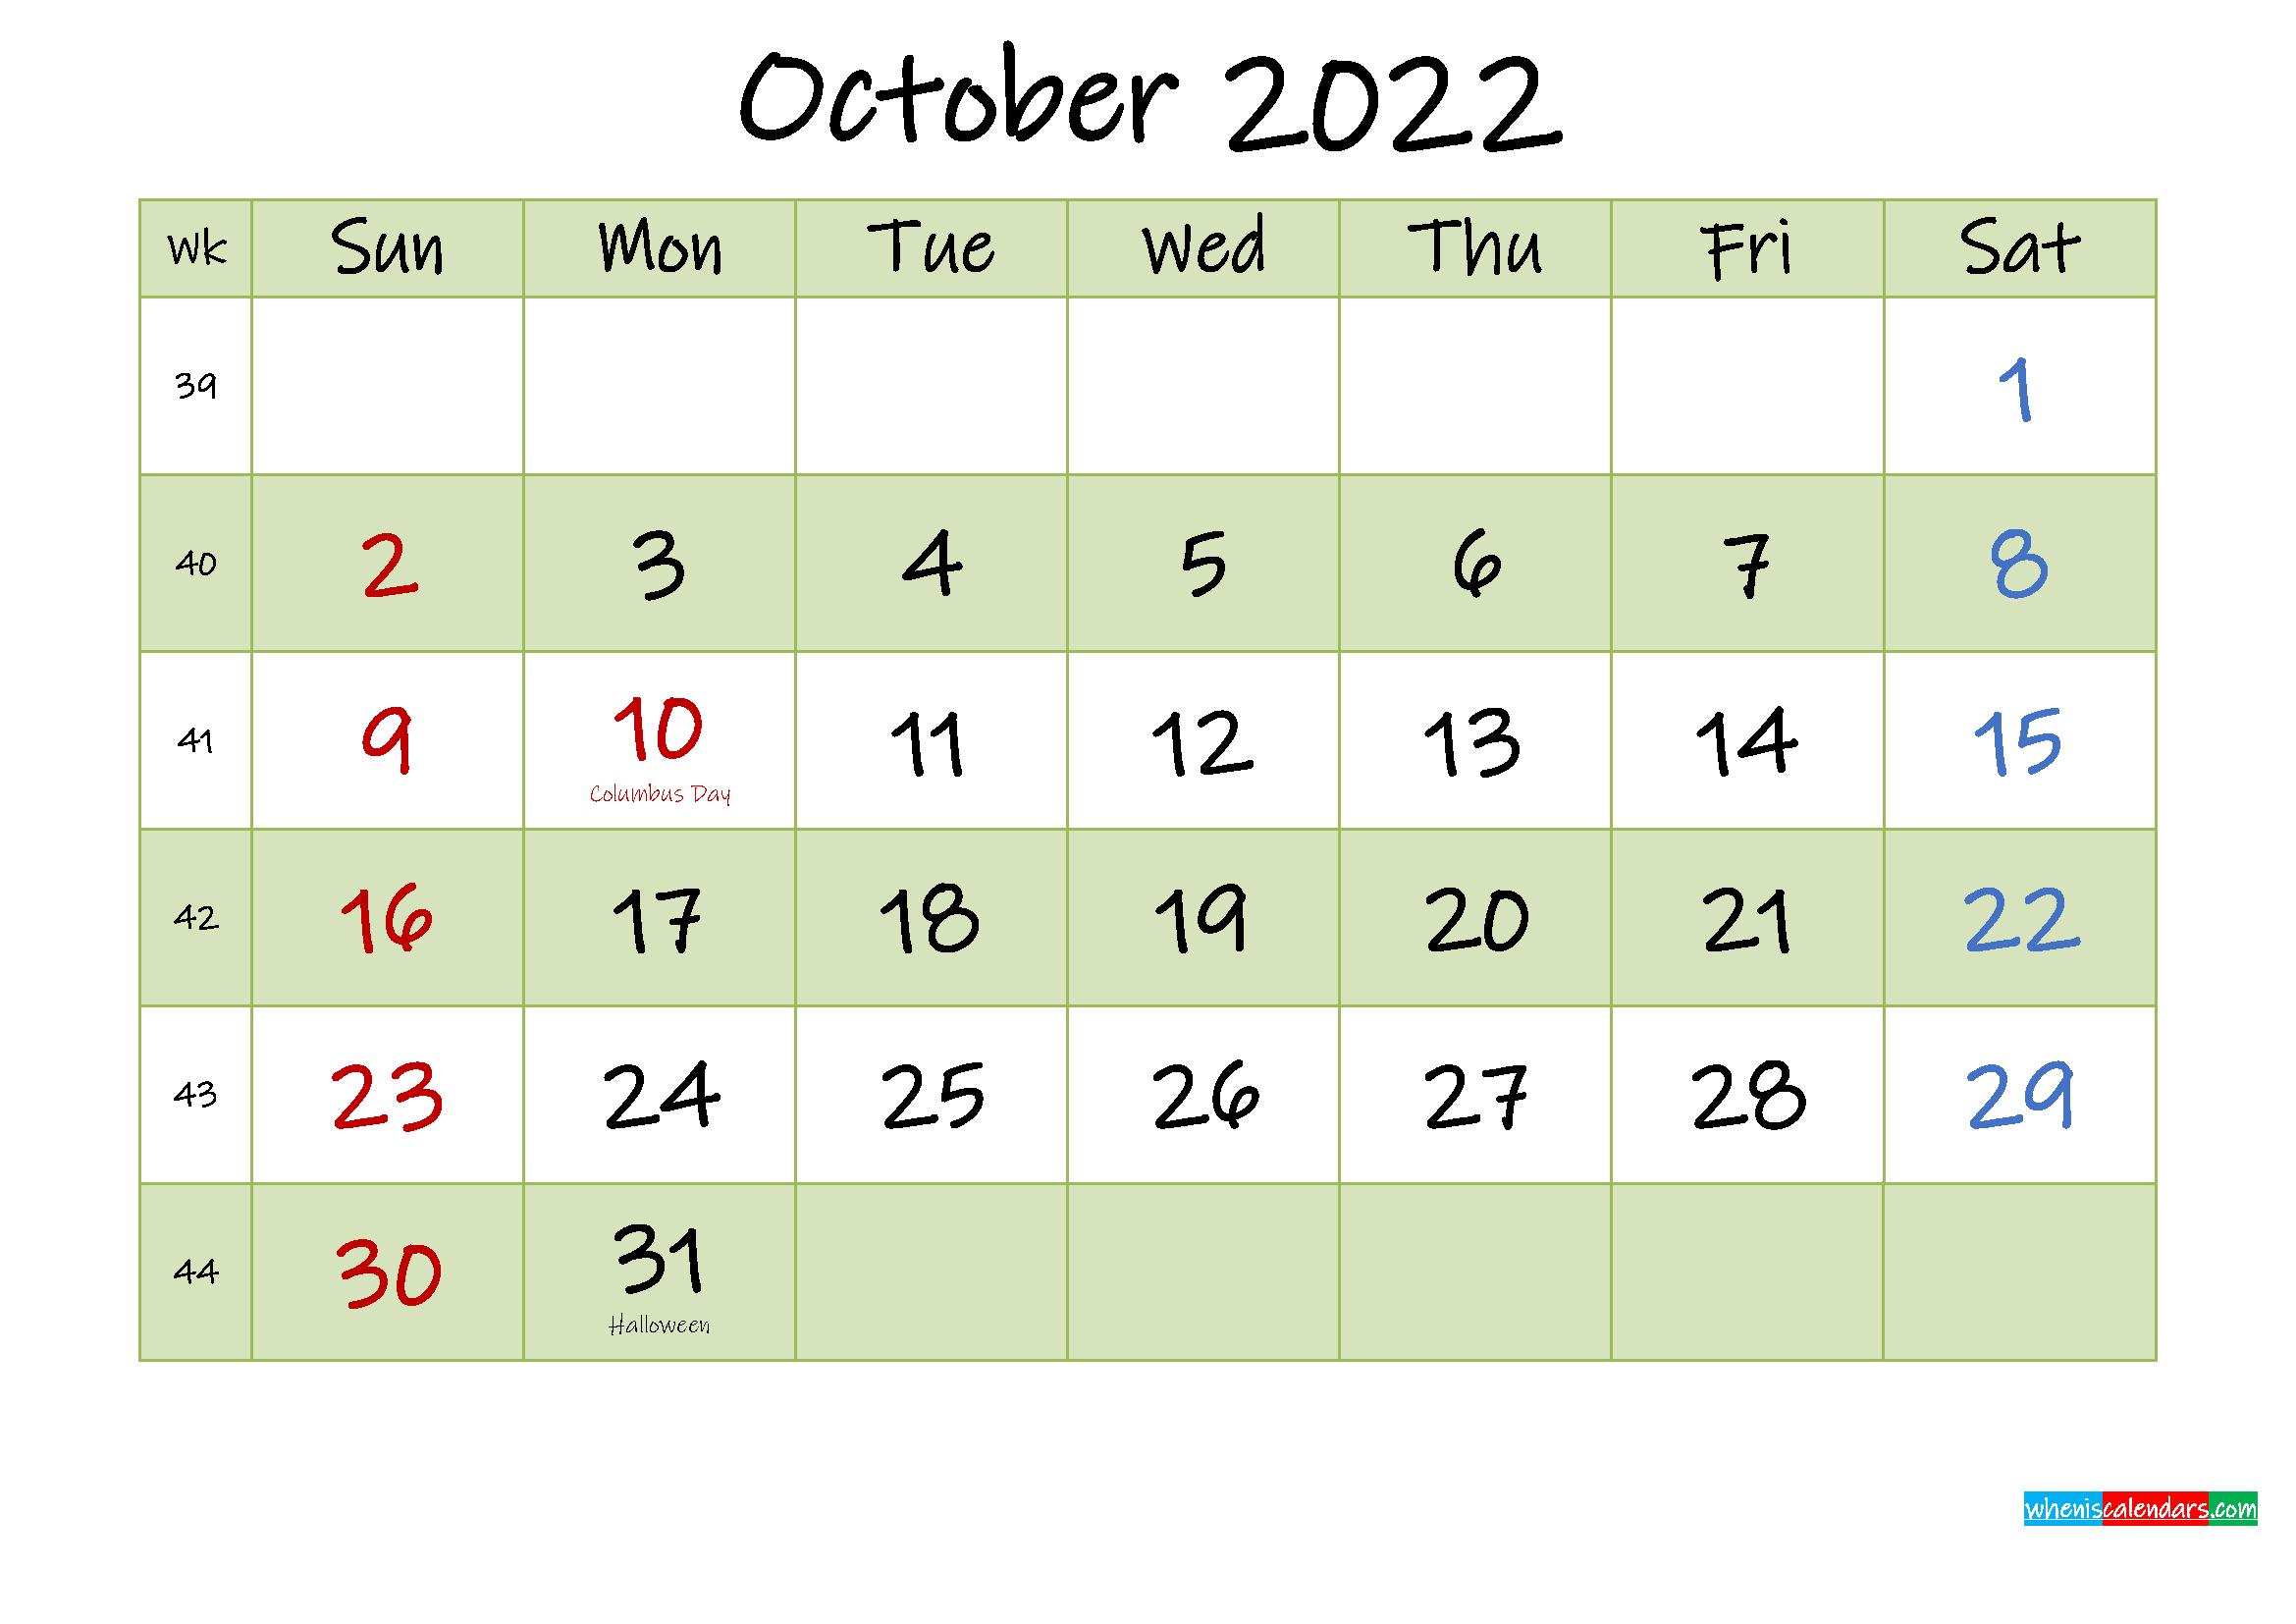 October 2022 Calendar with Holidays Printable